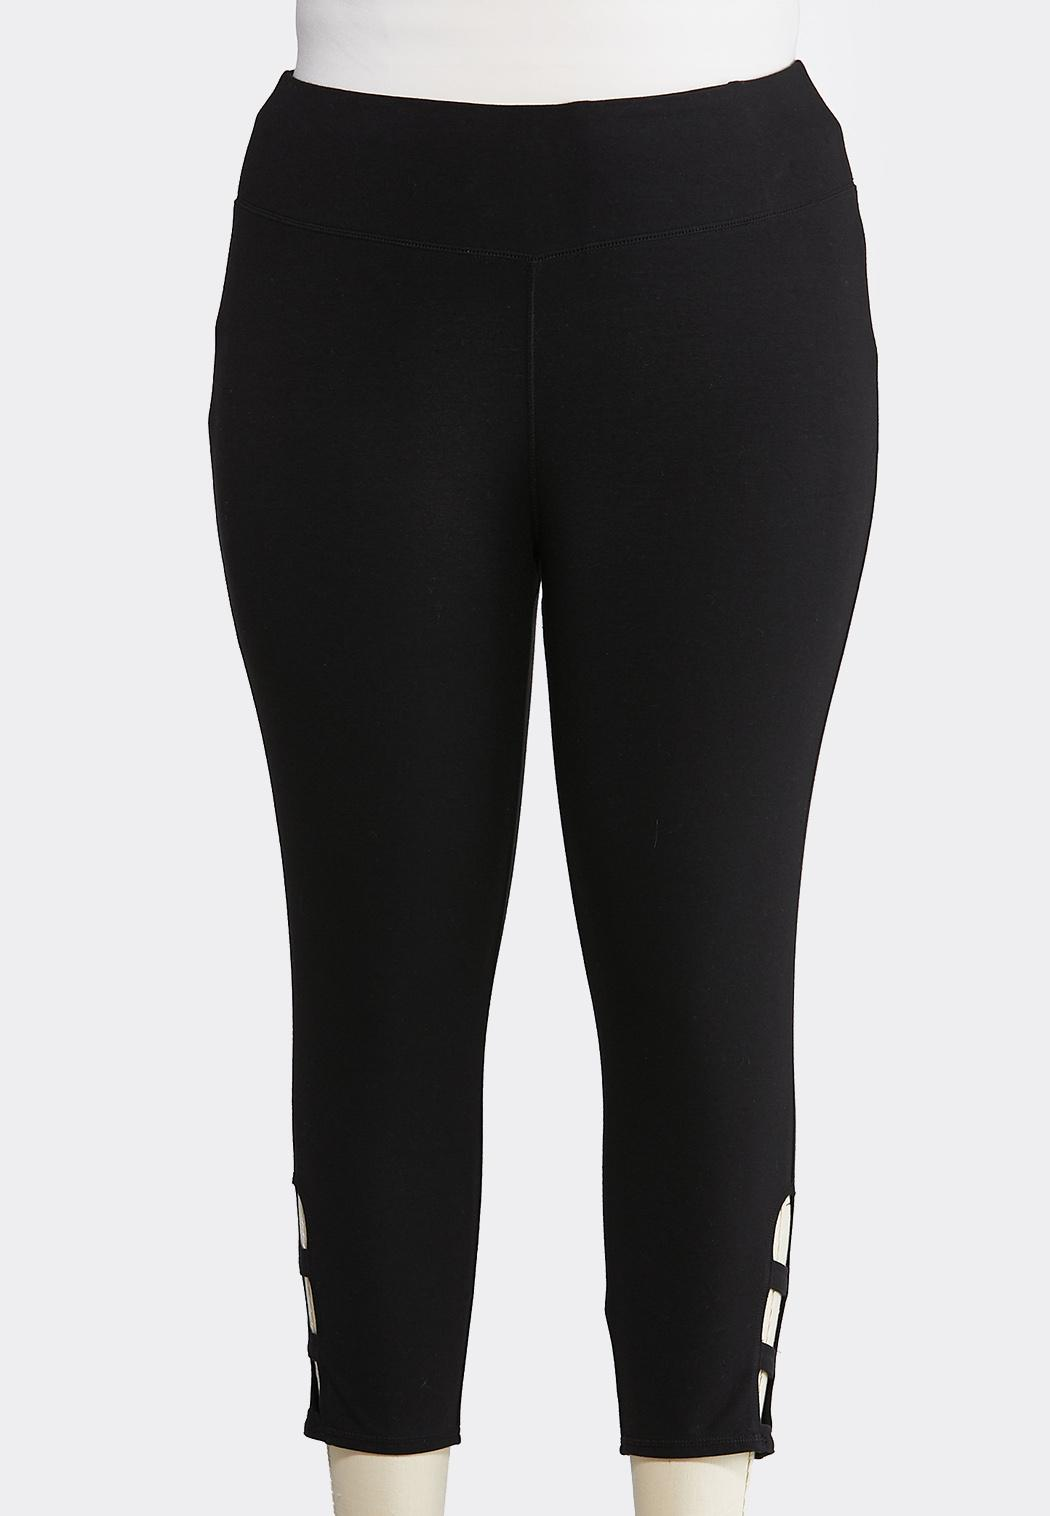 300d50a722b Plus Size Cutout Lattice Cropped Leggings Bottoms Cato Fashions